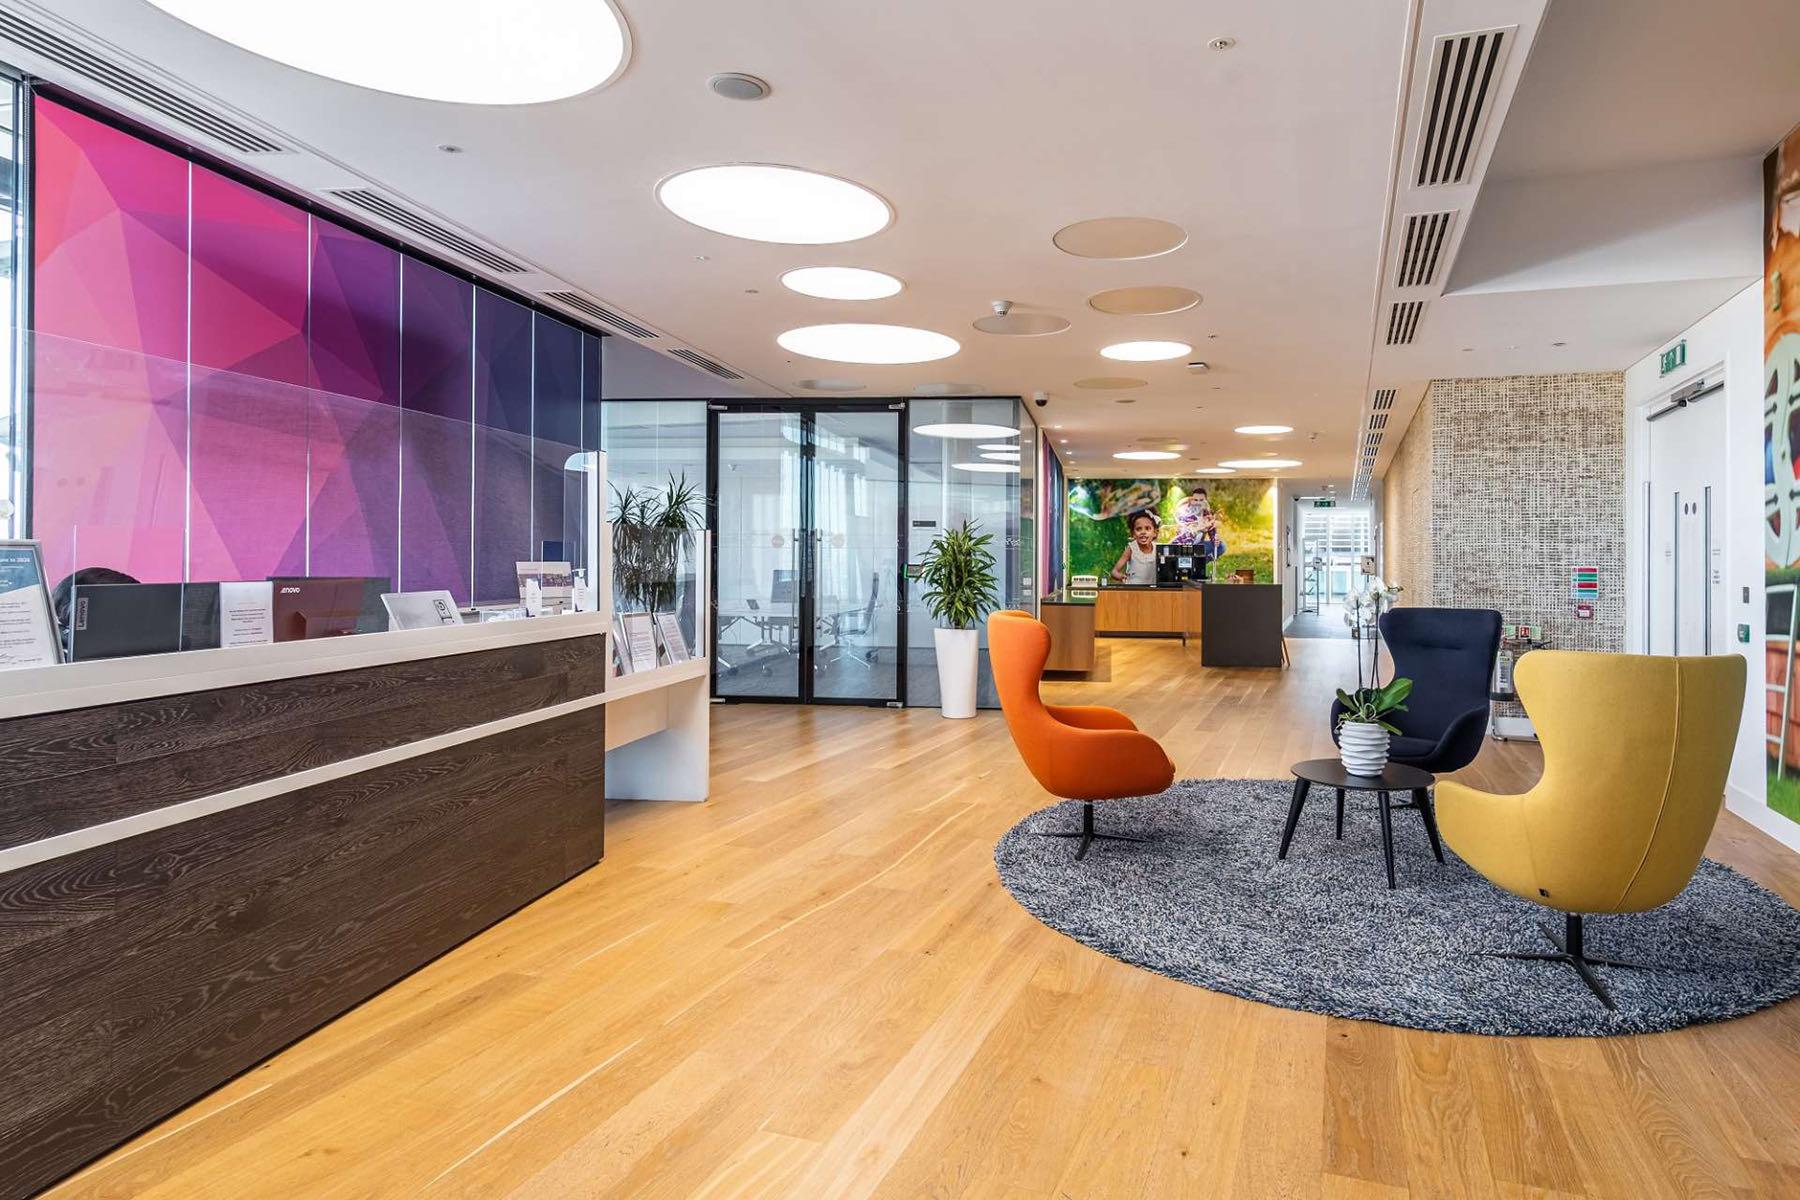 global-pharmateutical-company-office-3